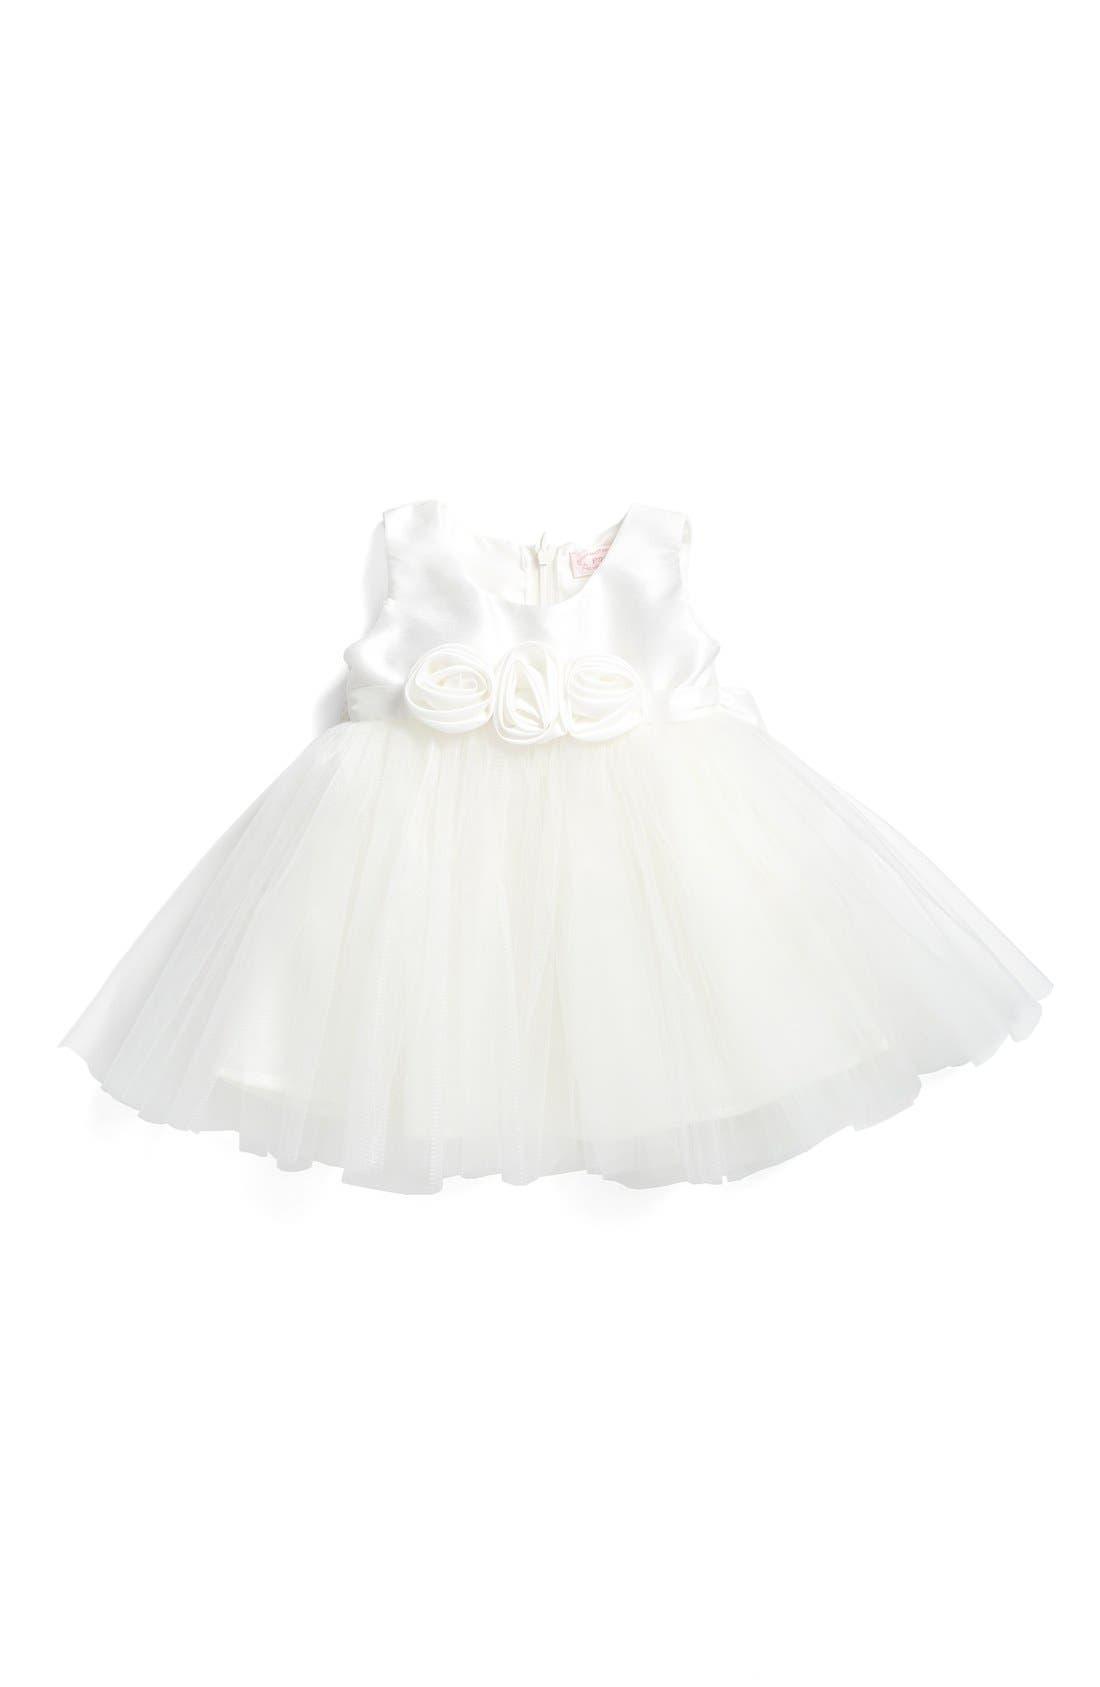 Rosette Fit & Flare Dress,                             Main thumbnail 1, color,                             WHITE